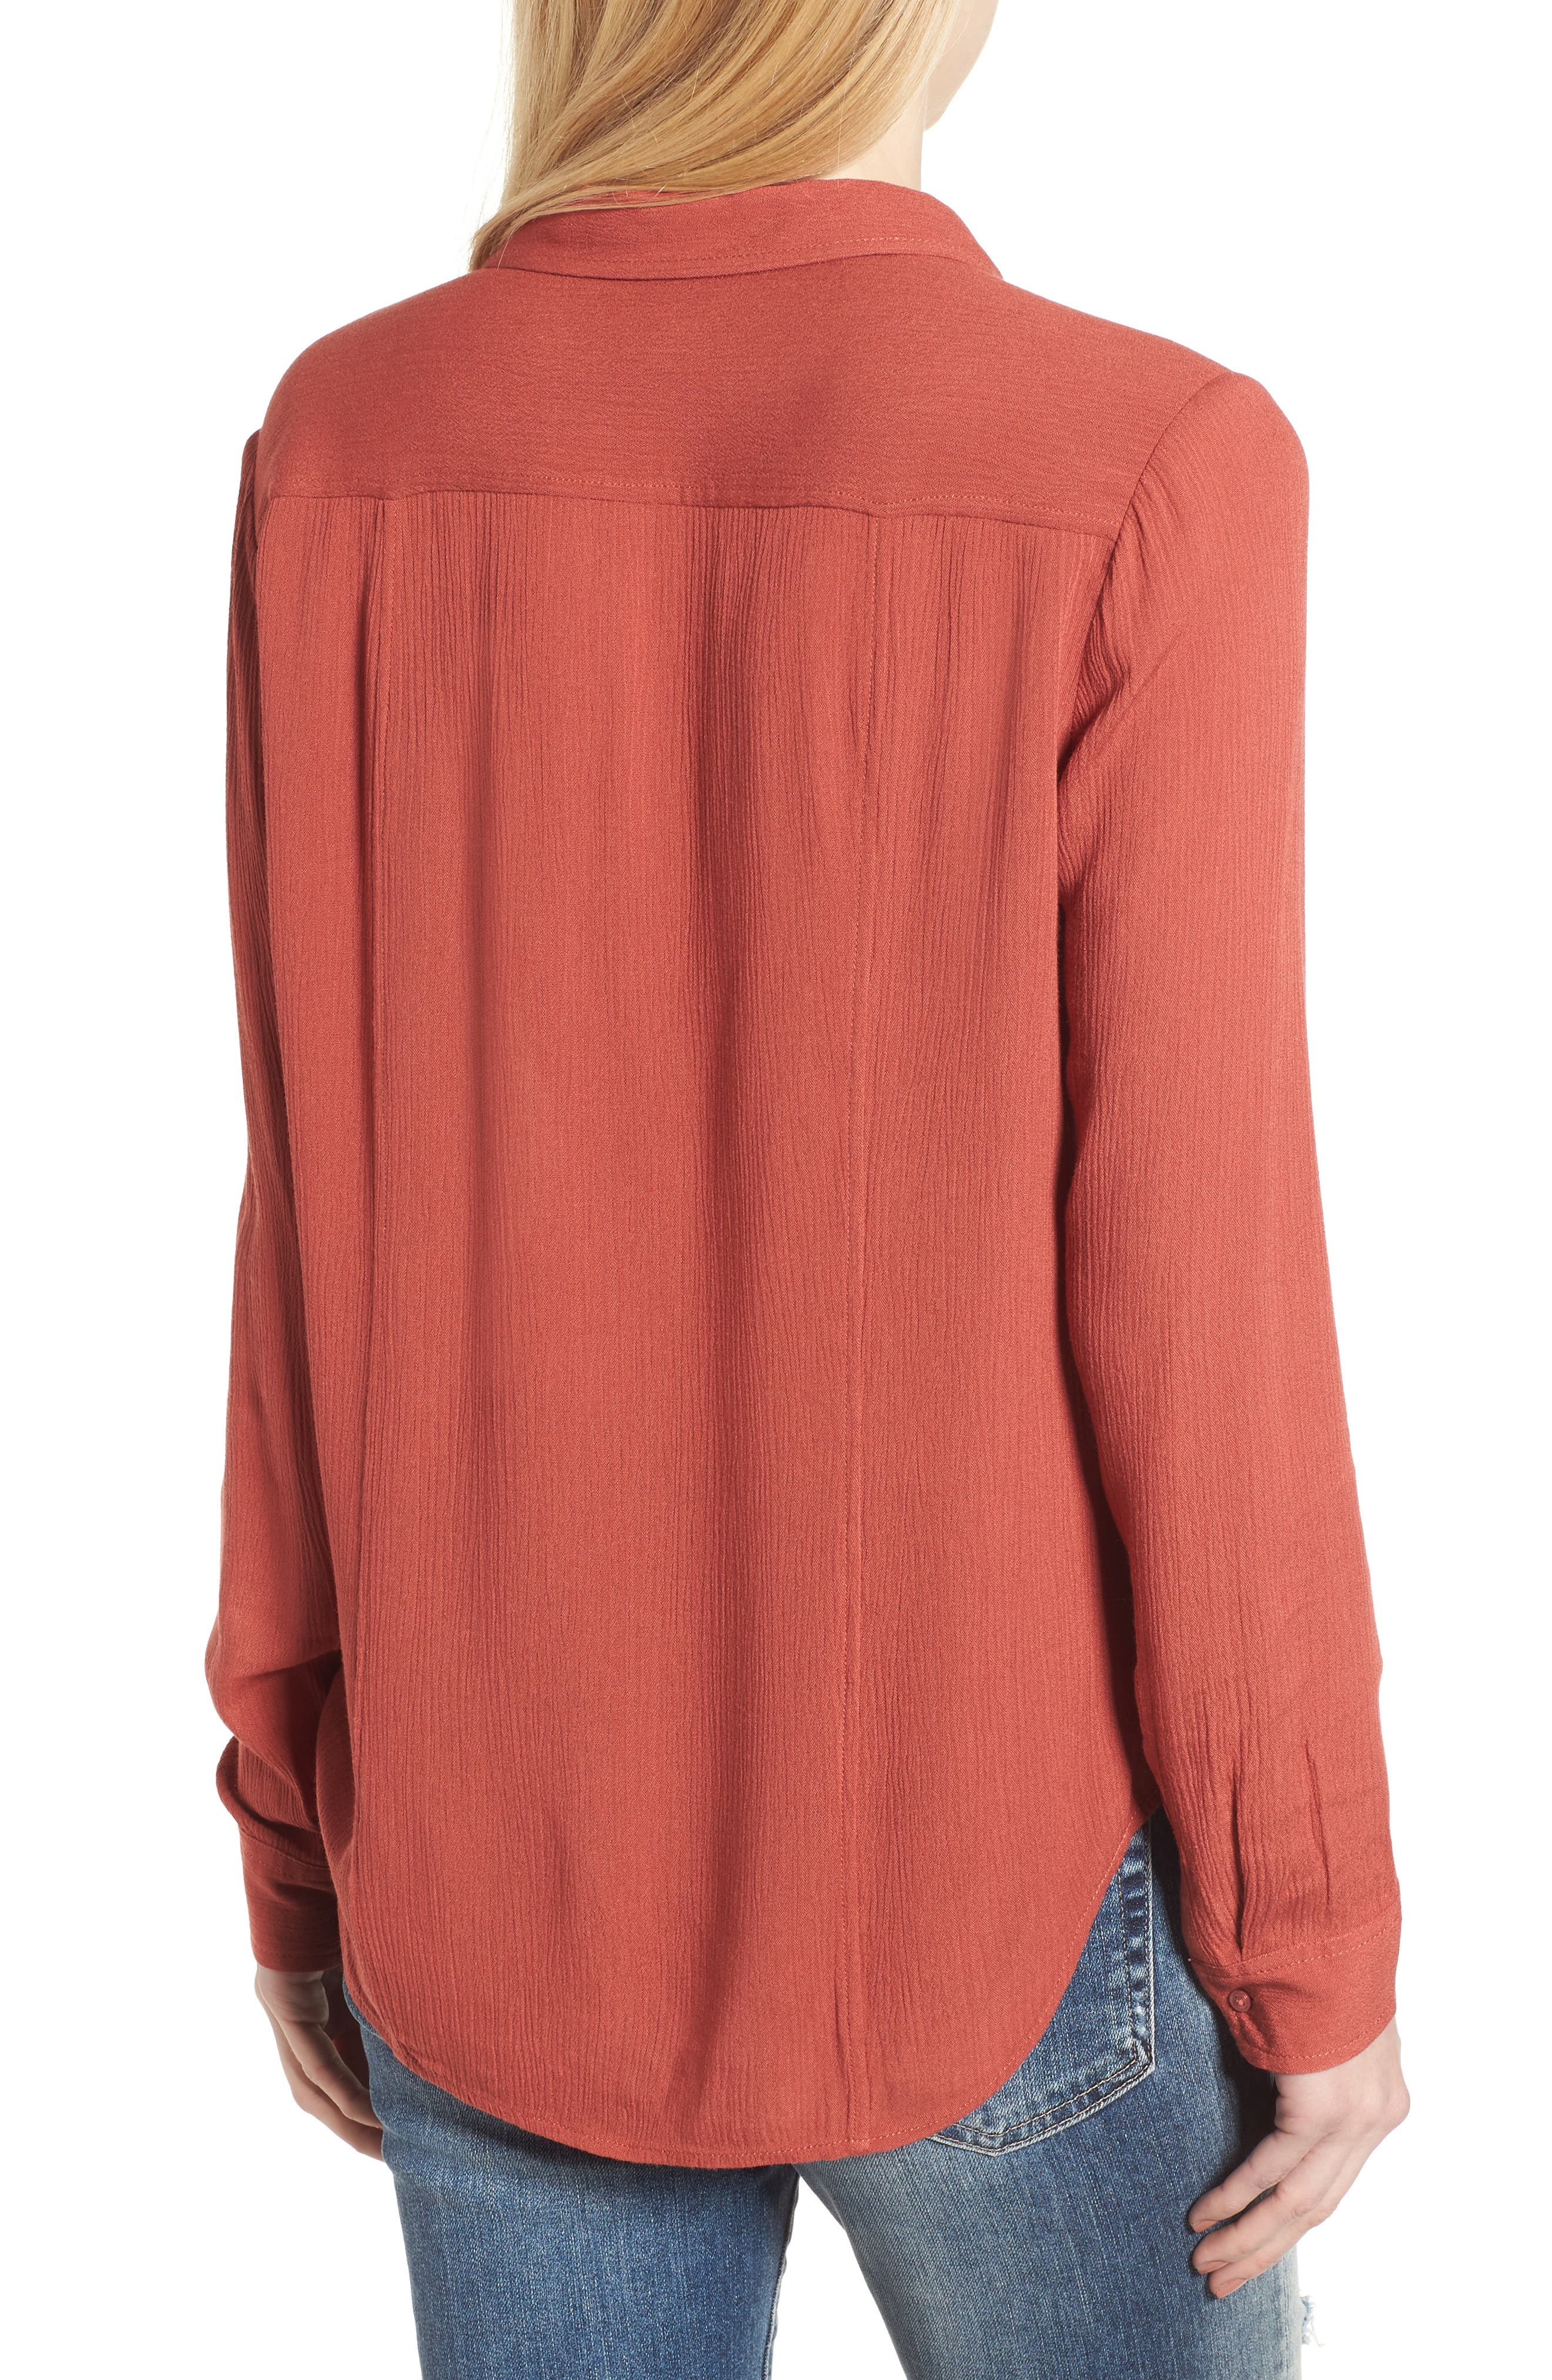 Nevada Cotton Henley Shirt,                             Alternate thumbnail 2, color,                             Firebrick